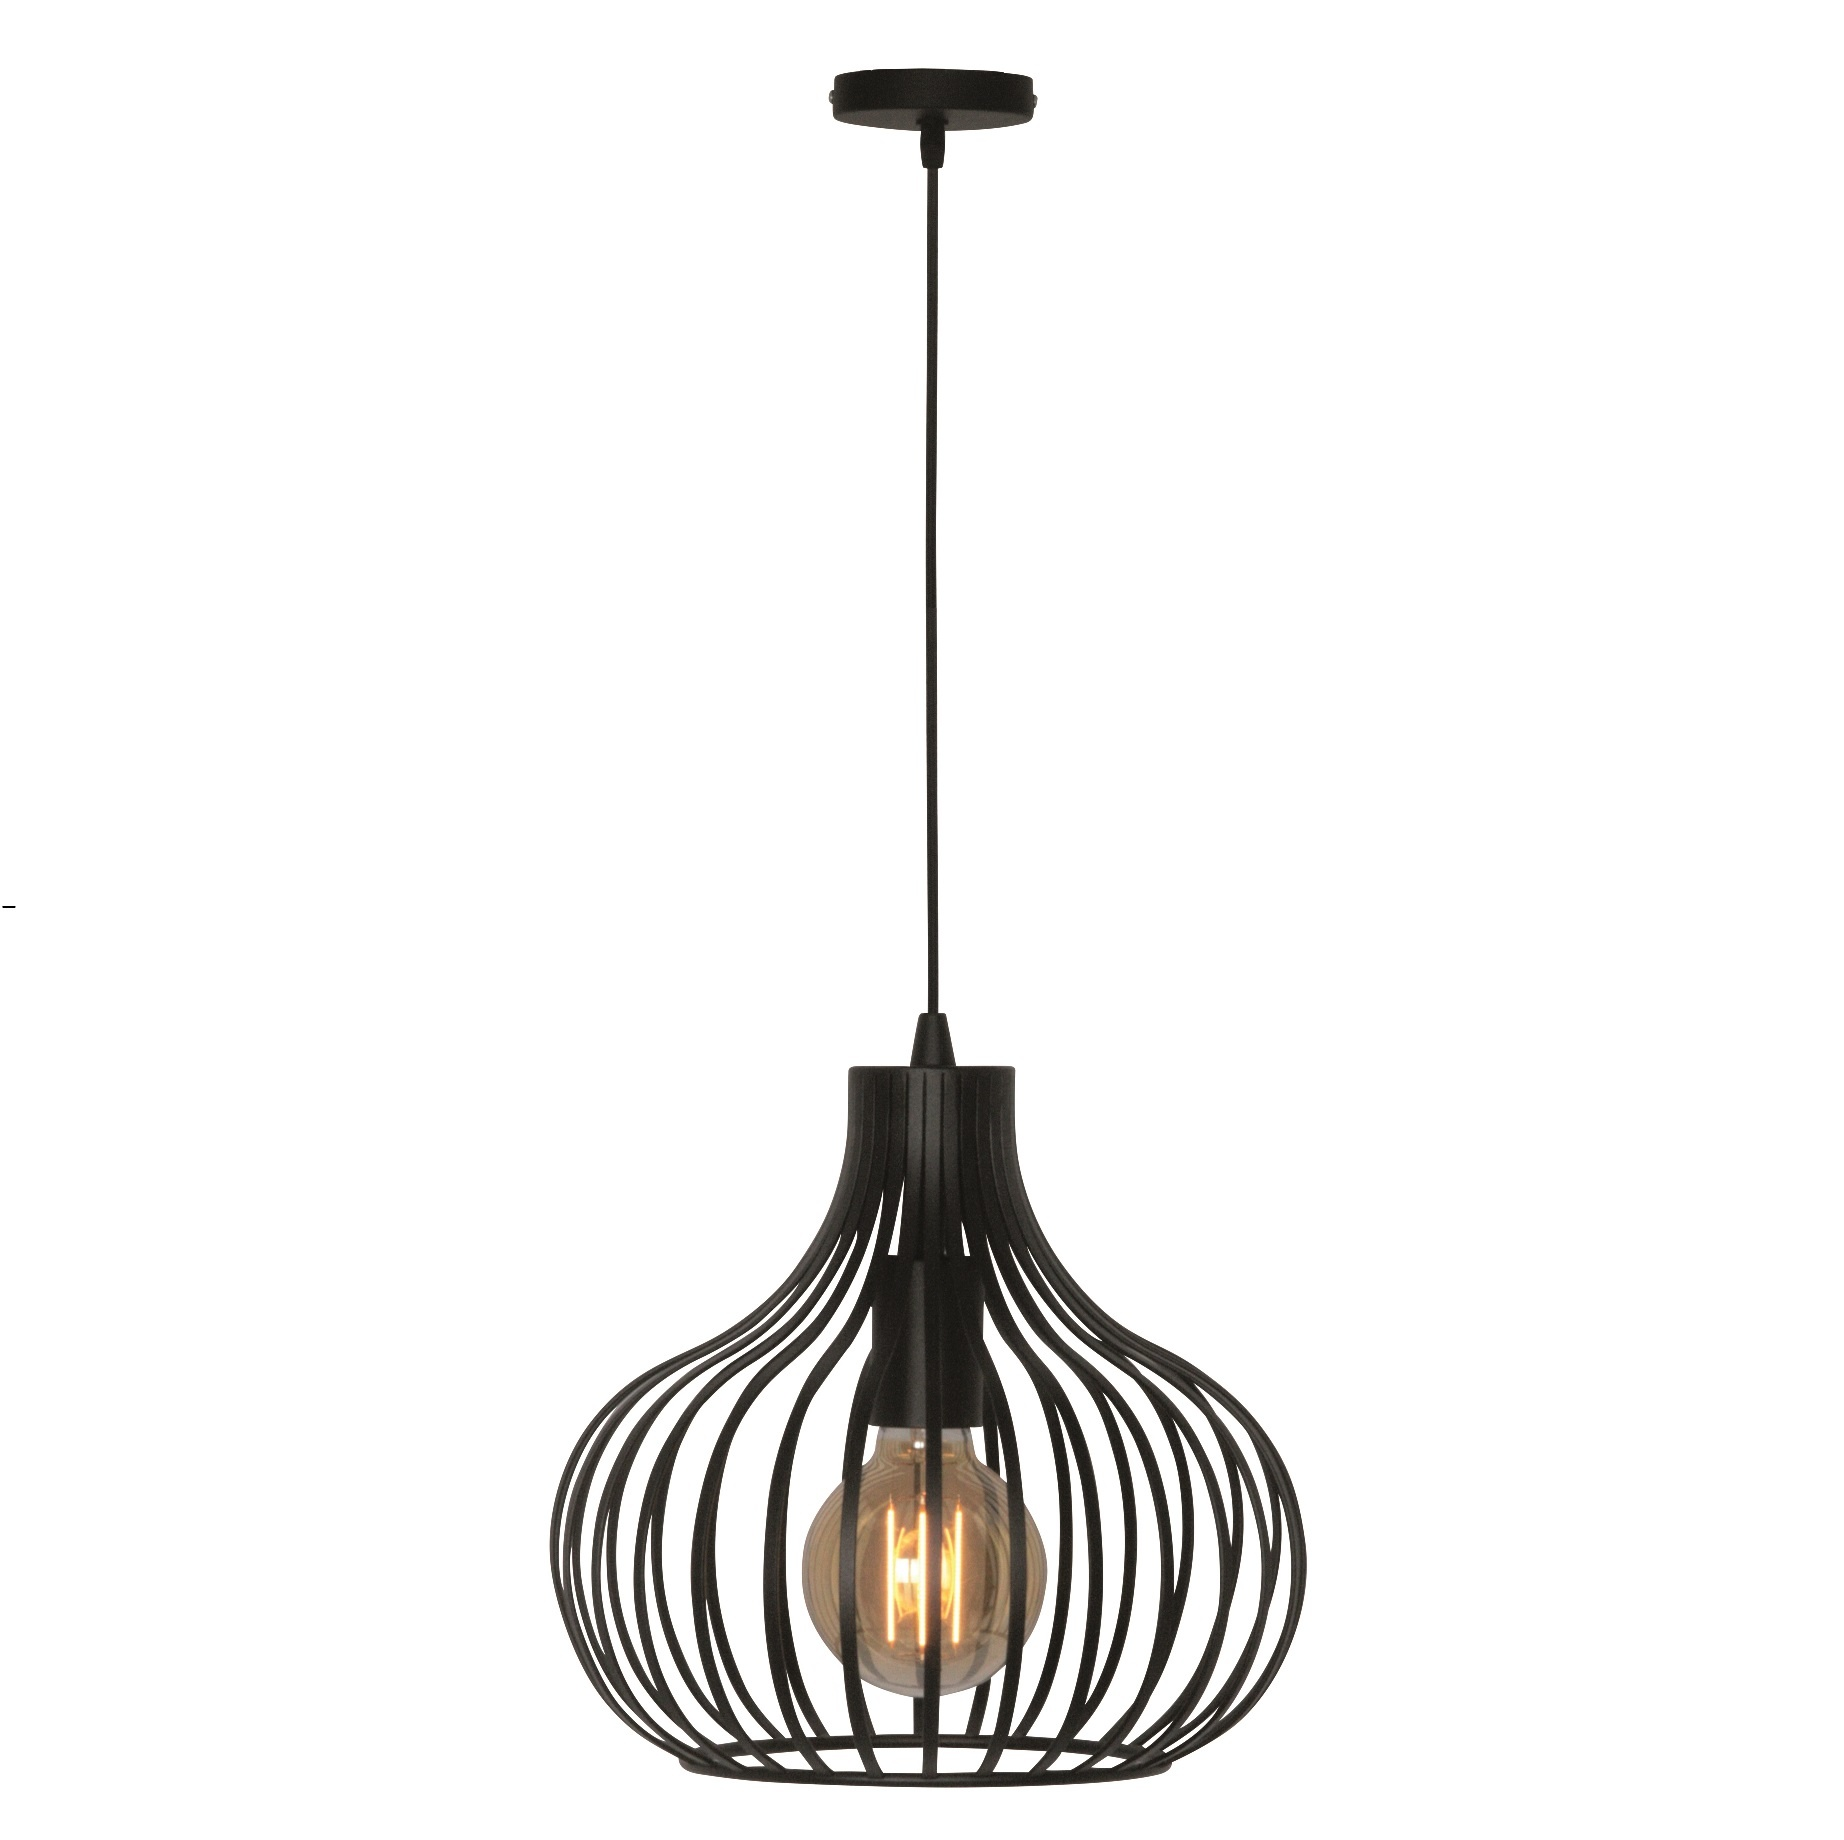 Hanglamp Aglio 28 cm Zwart